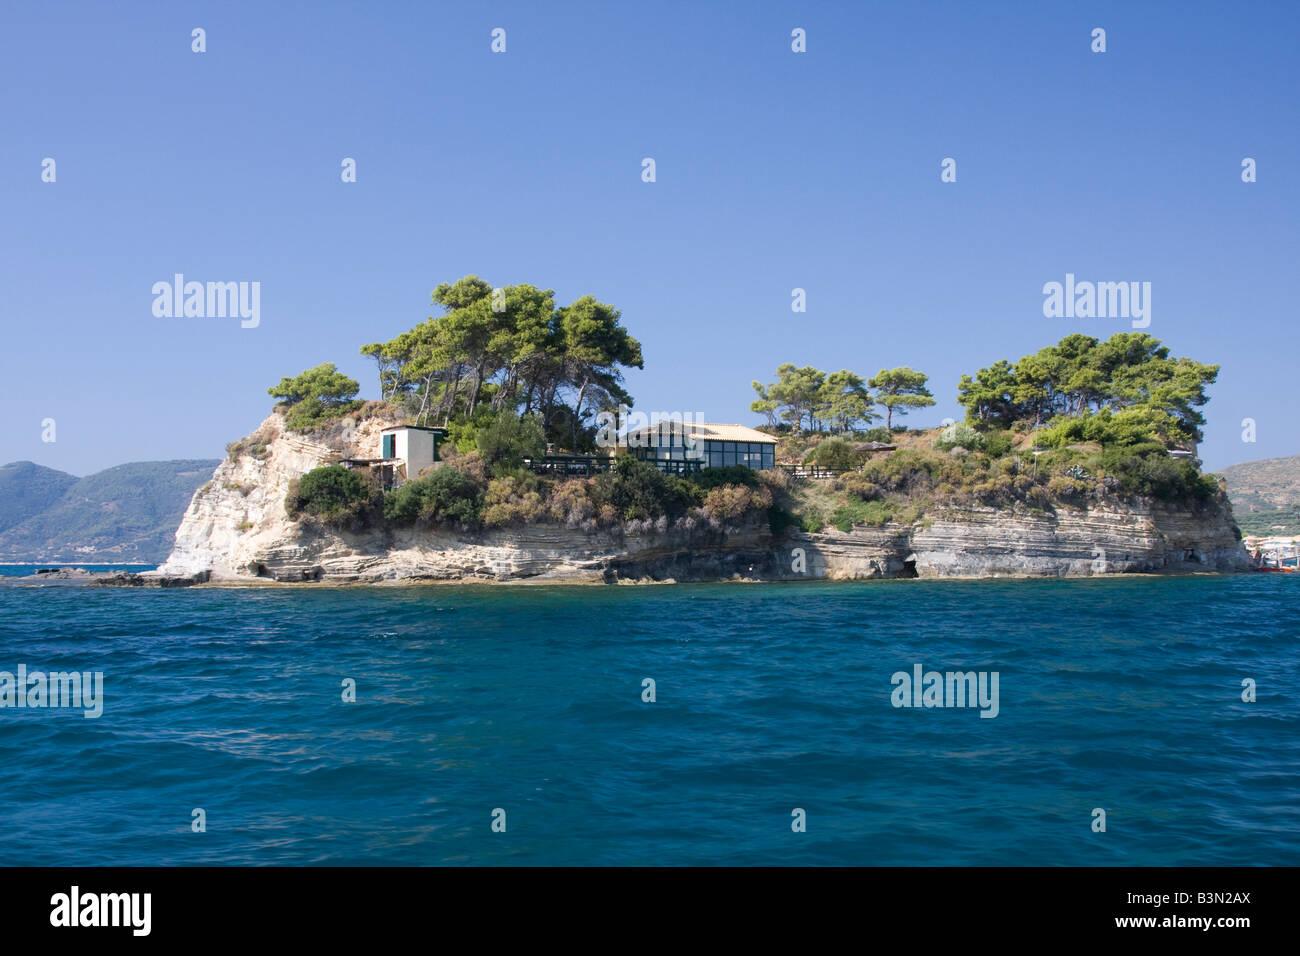 Greece scenery - Stock Image